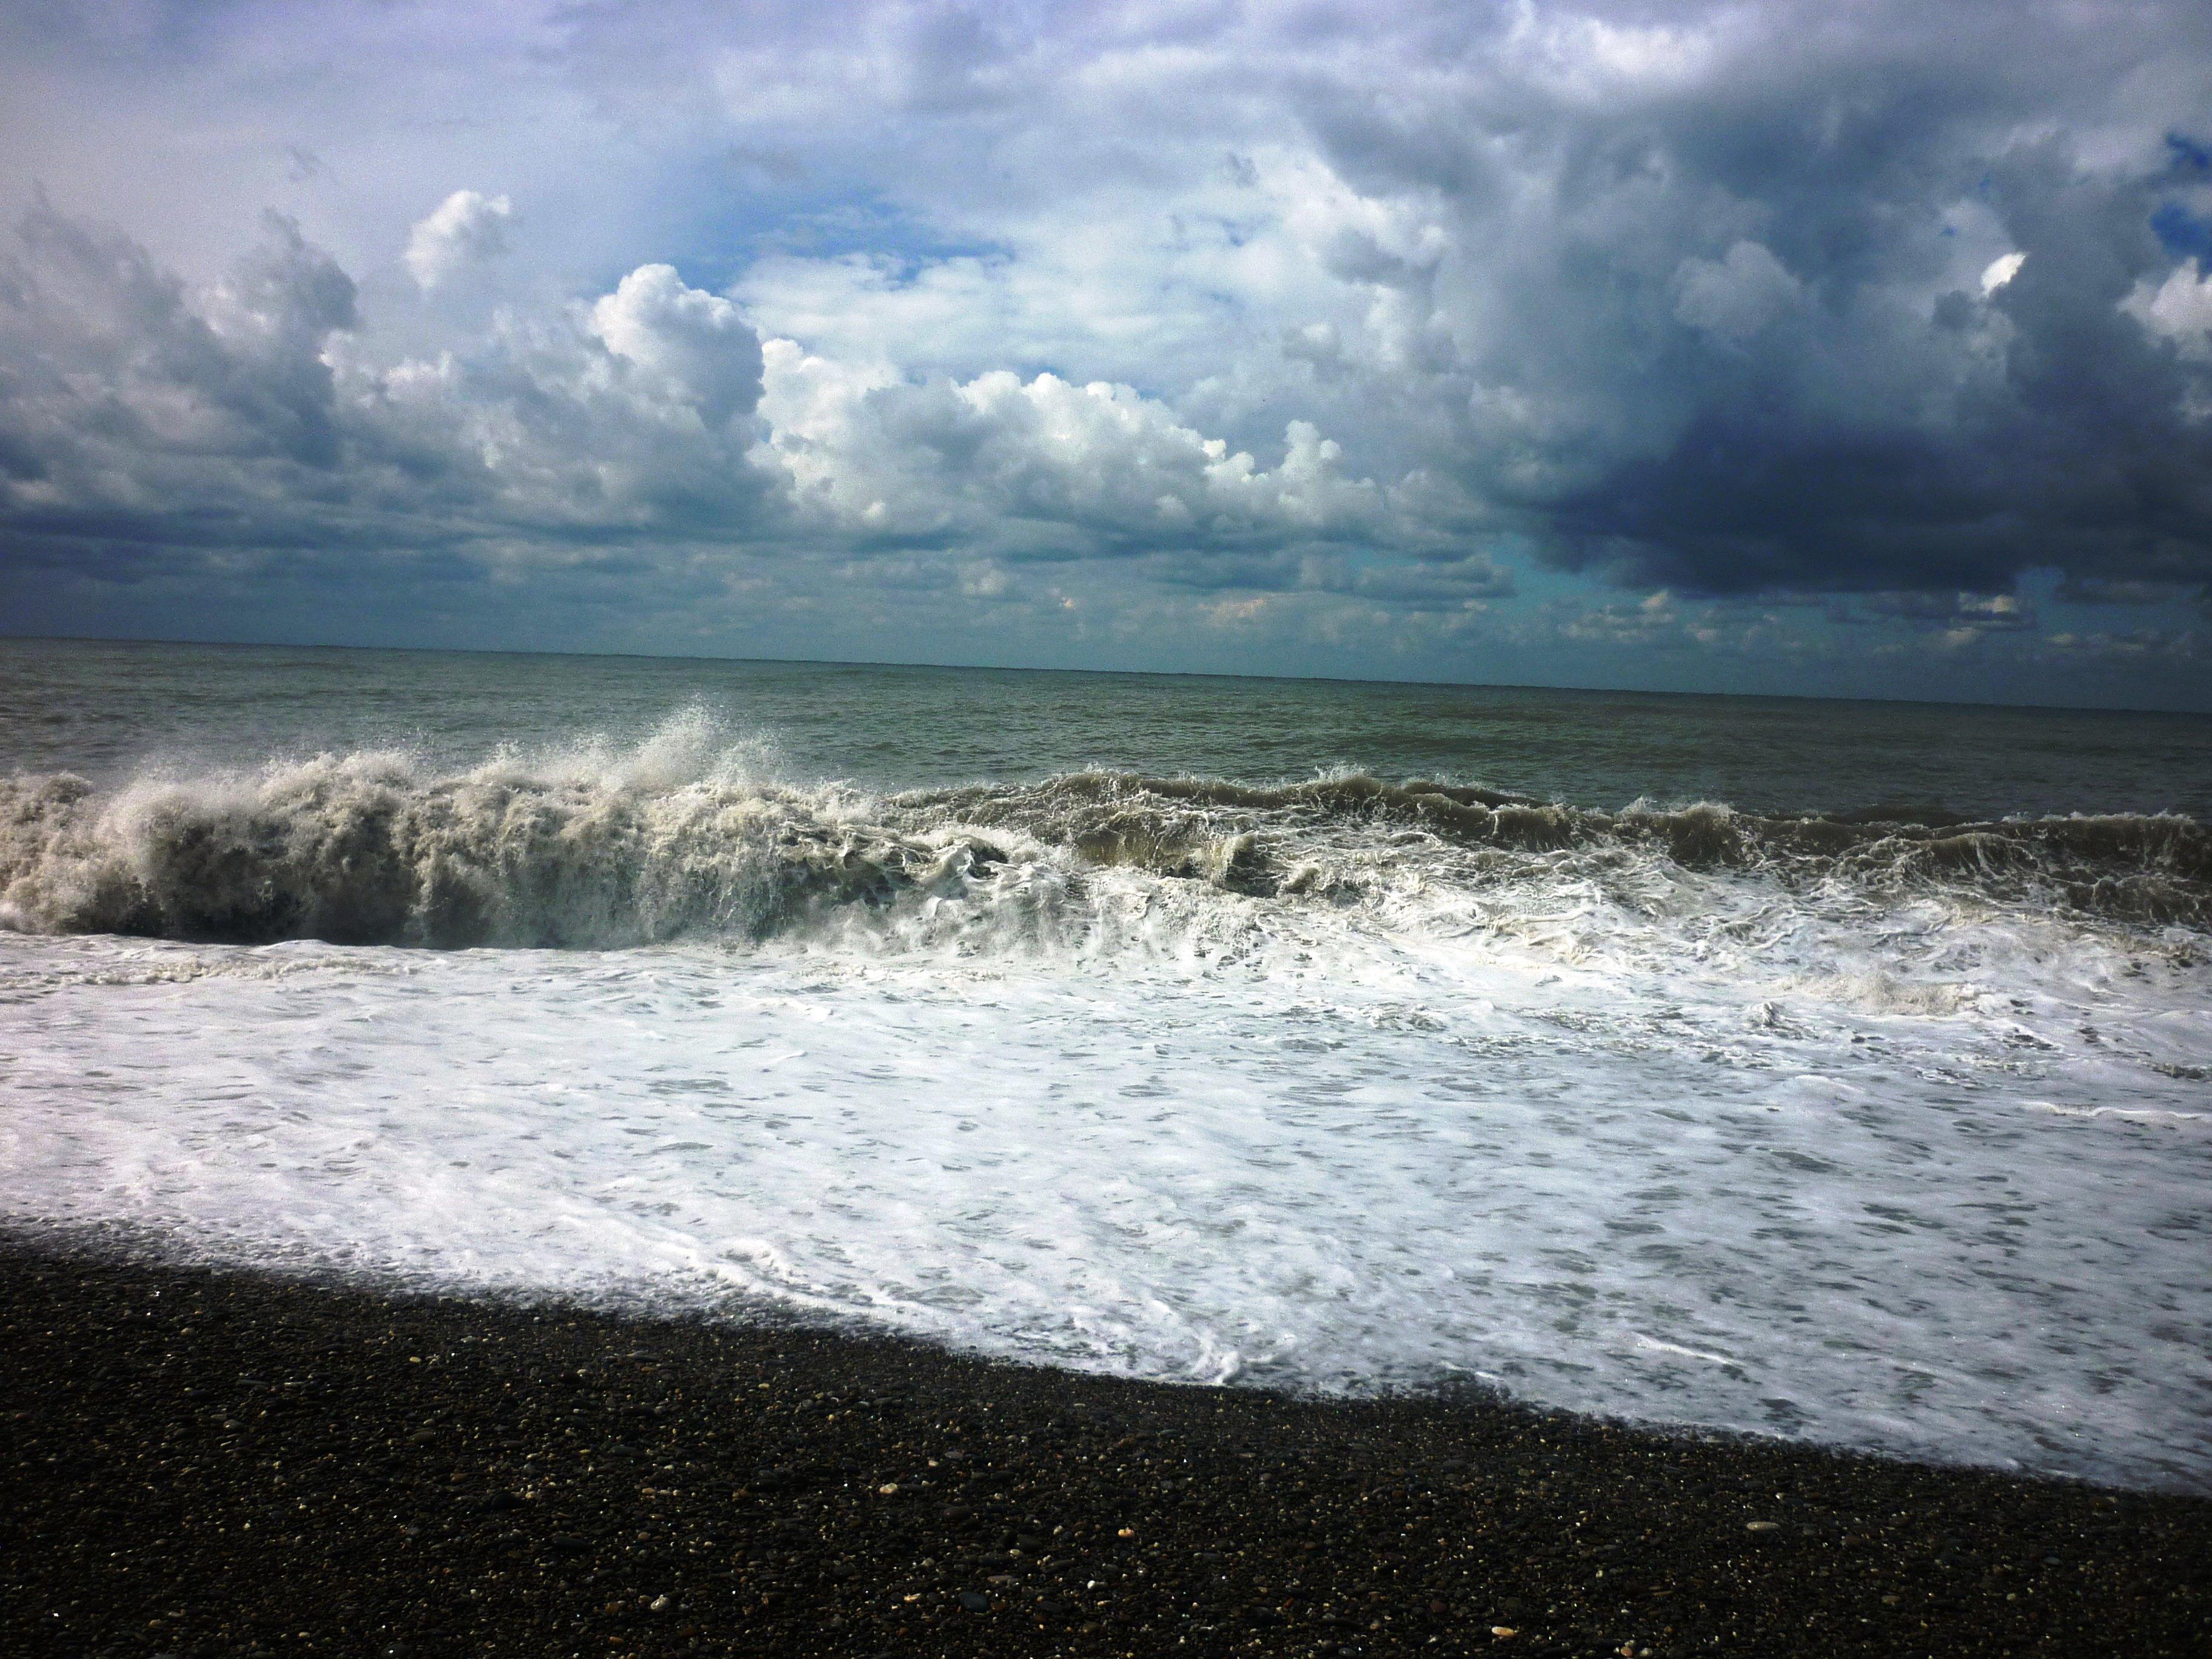 Beach And Ocean Storm: Black Sea Storm Clouds Beach Waves Ocean Wallpaper